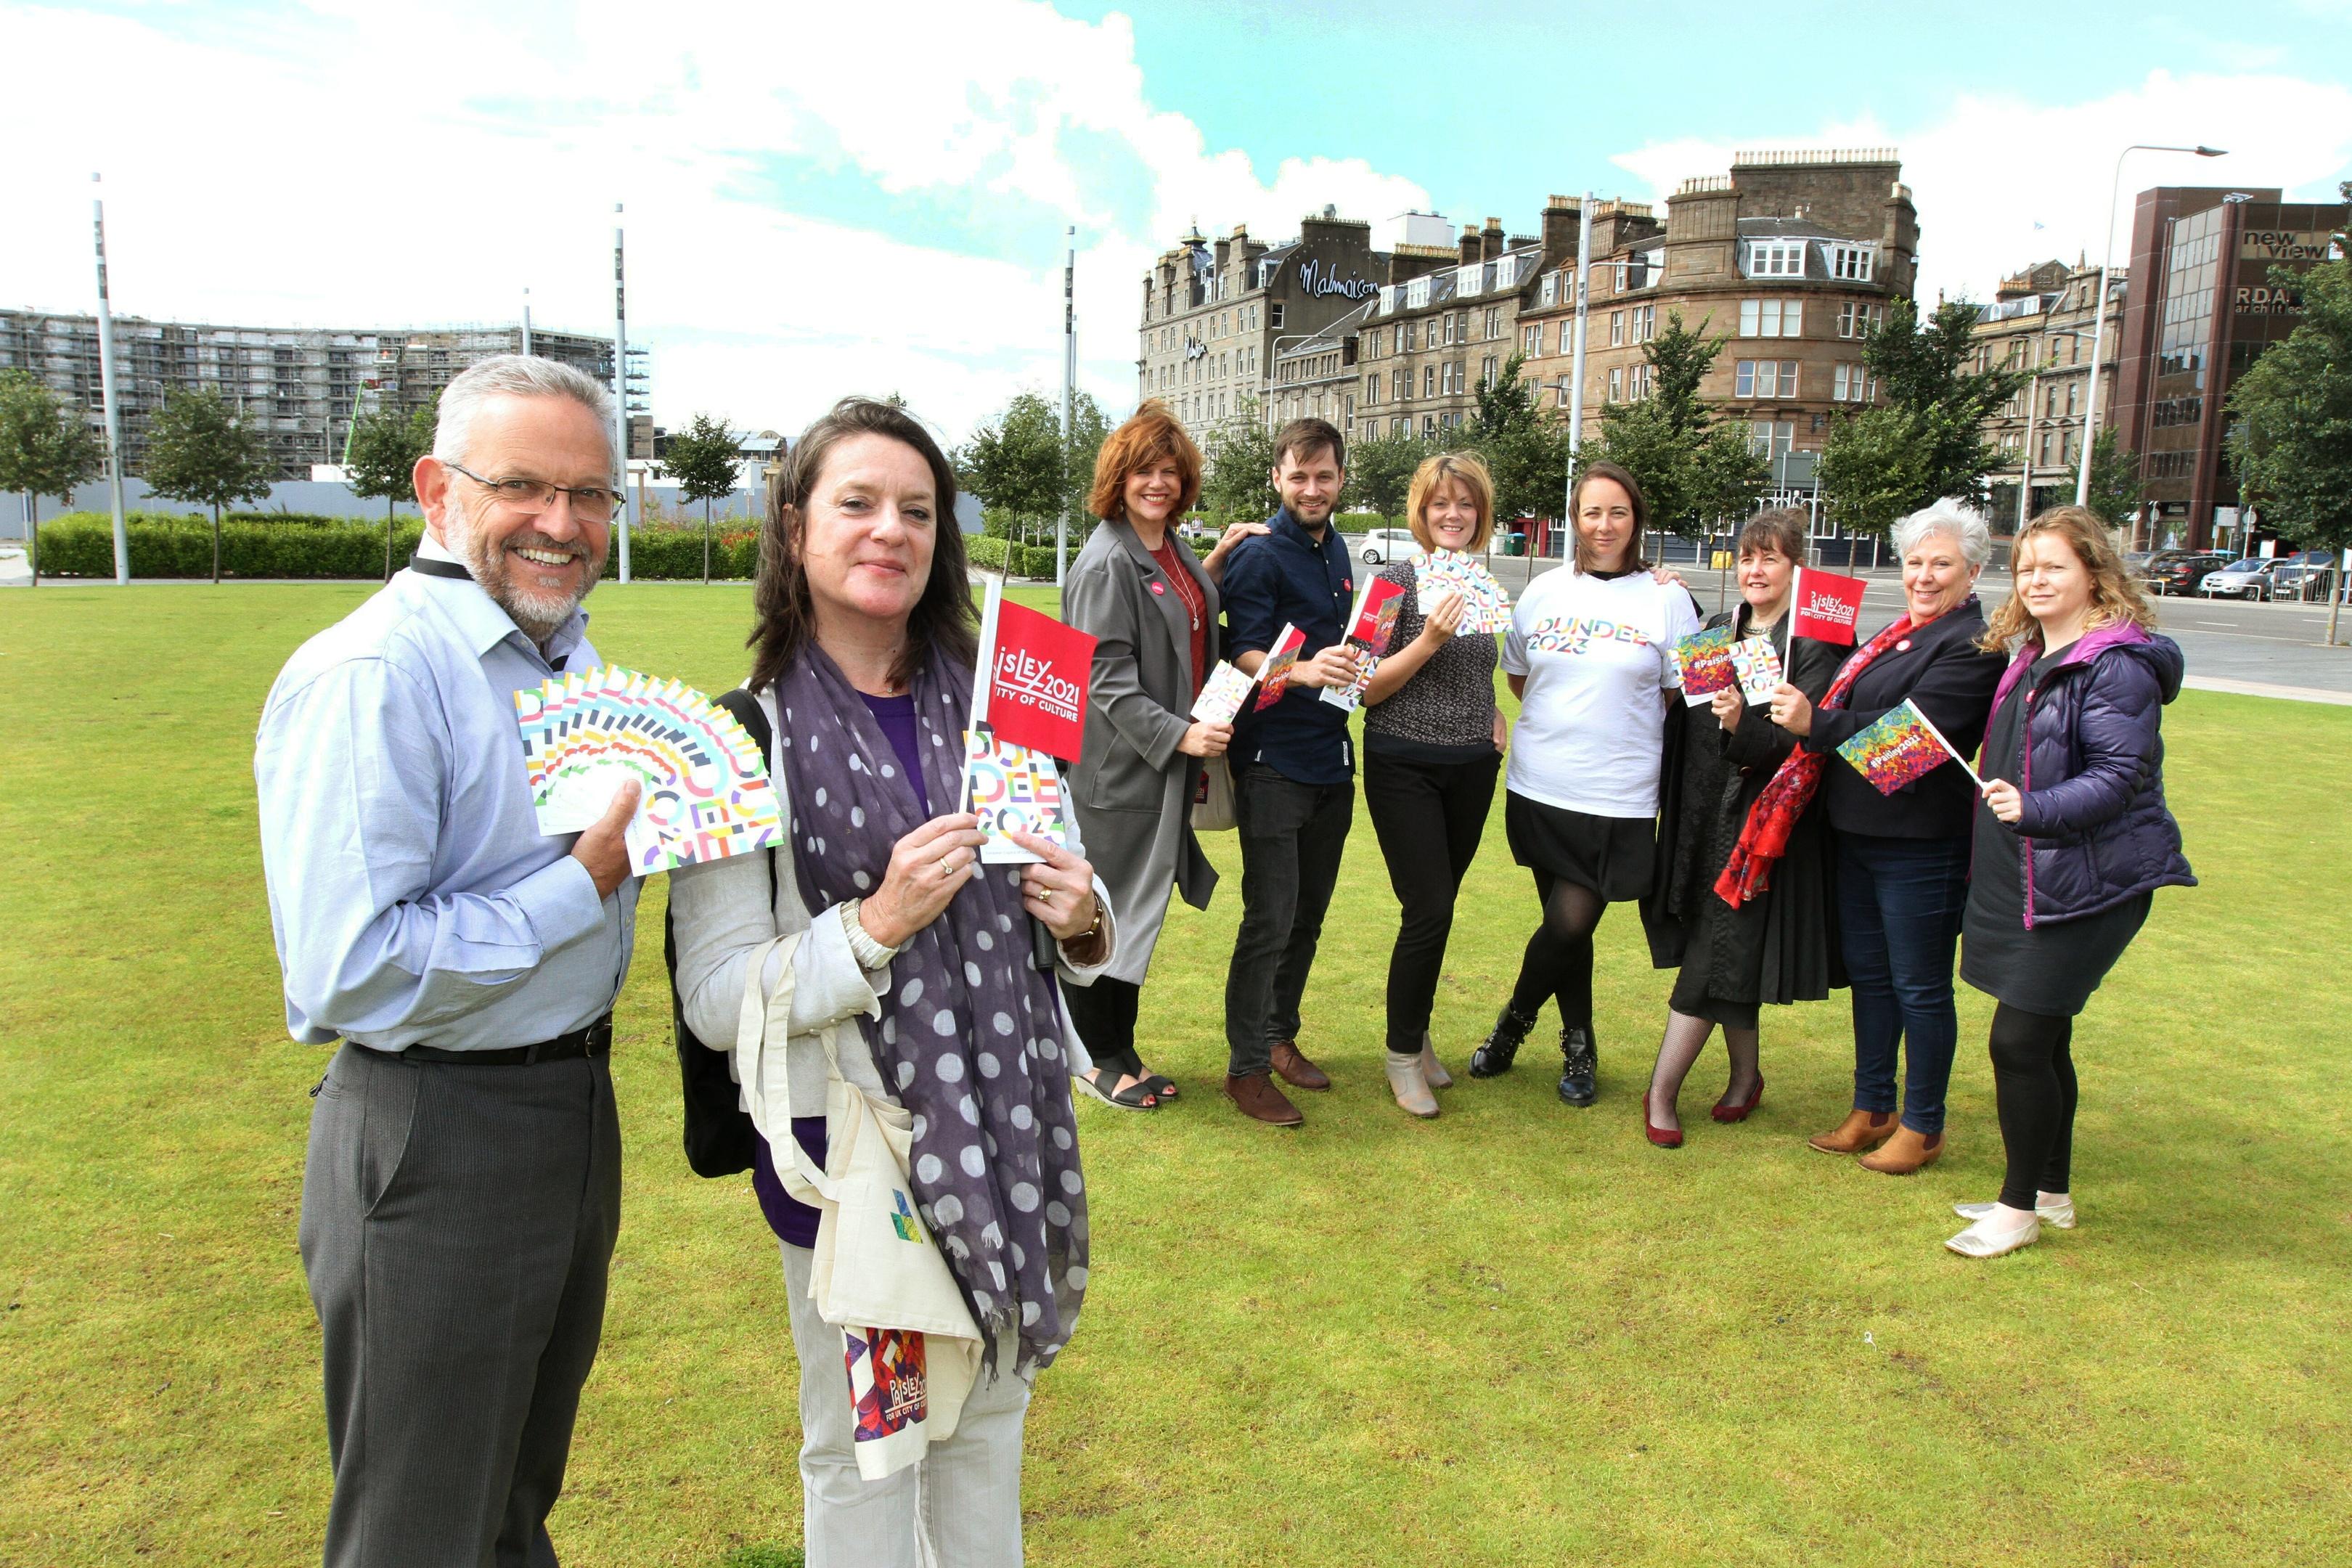 Paisley 2021 City of Culture, Creative Renfrewshire team visit Dundee. Picture shows Stewart Murdoch with Liz Gardiner  and Margaret Scott, ,Alan Clark, Gillian Easson, Anna Day, Annette Whitelaw, Lynn Rew and Morag McPherson.